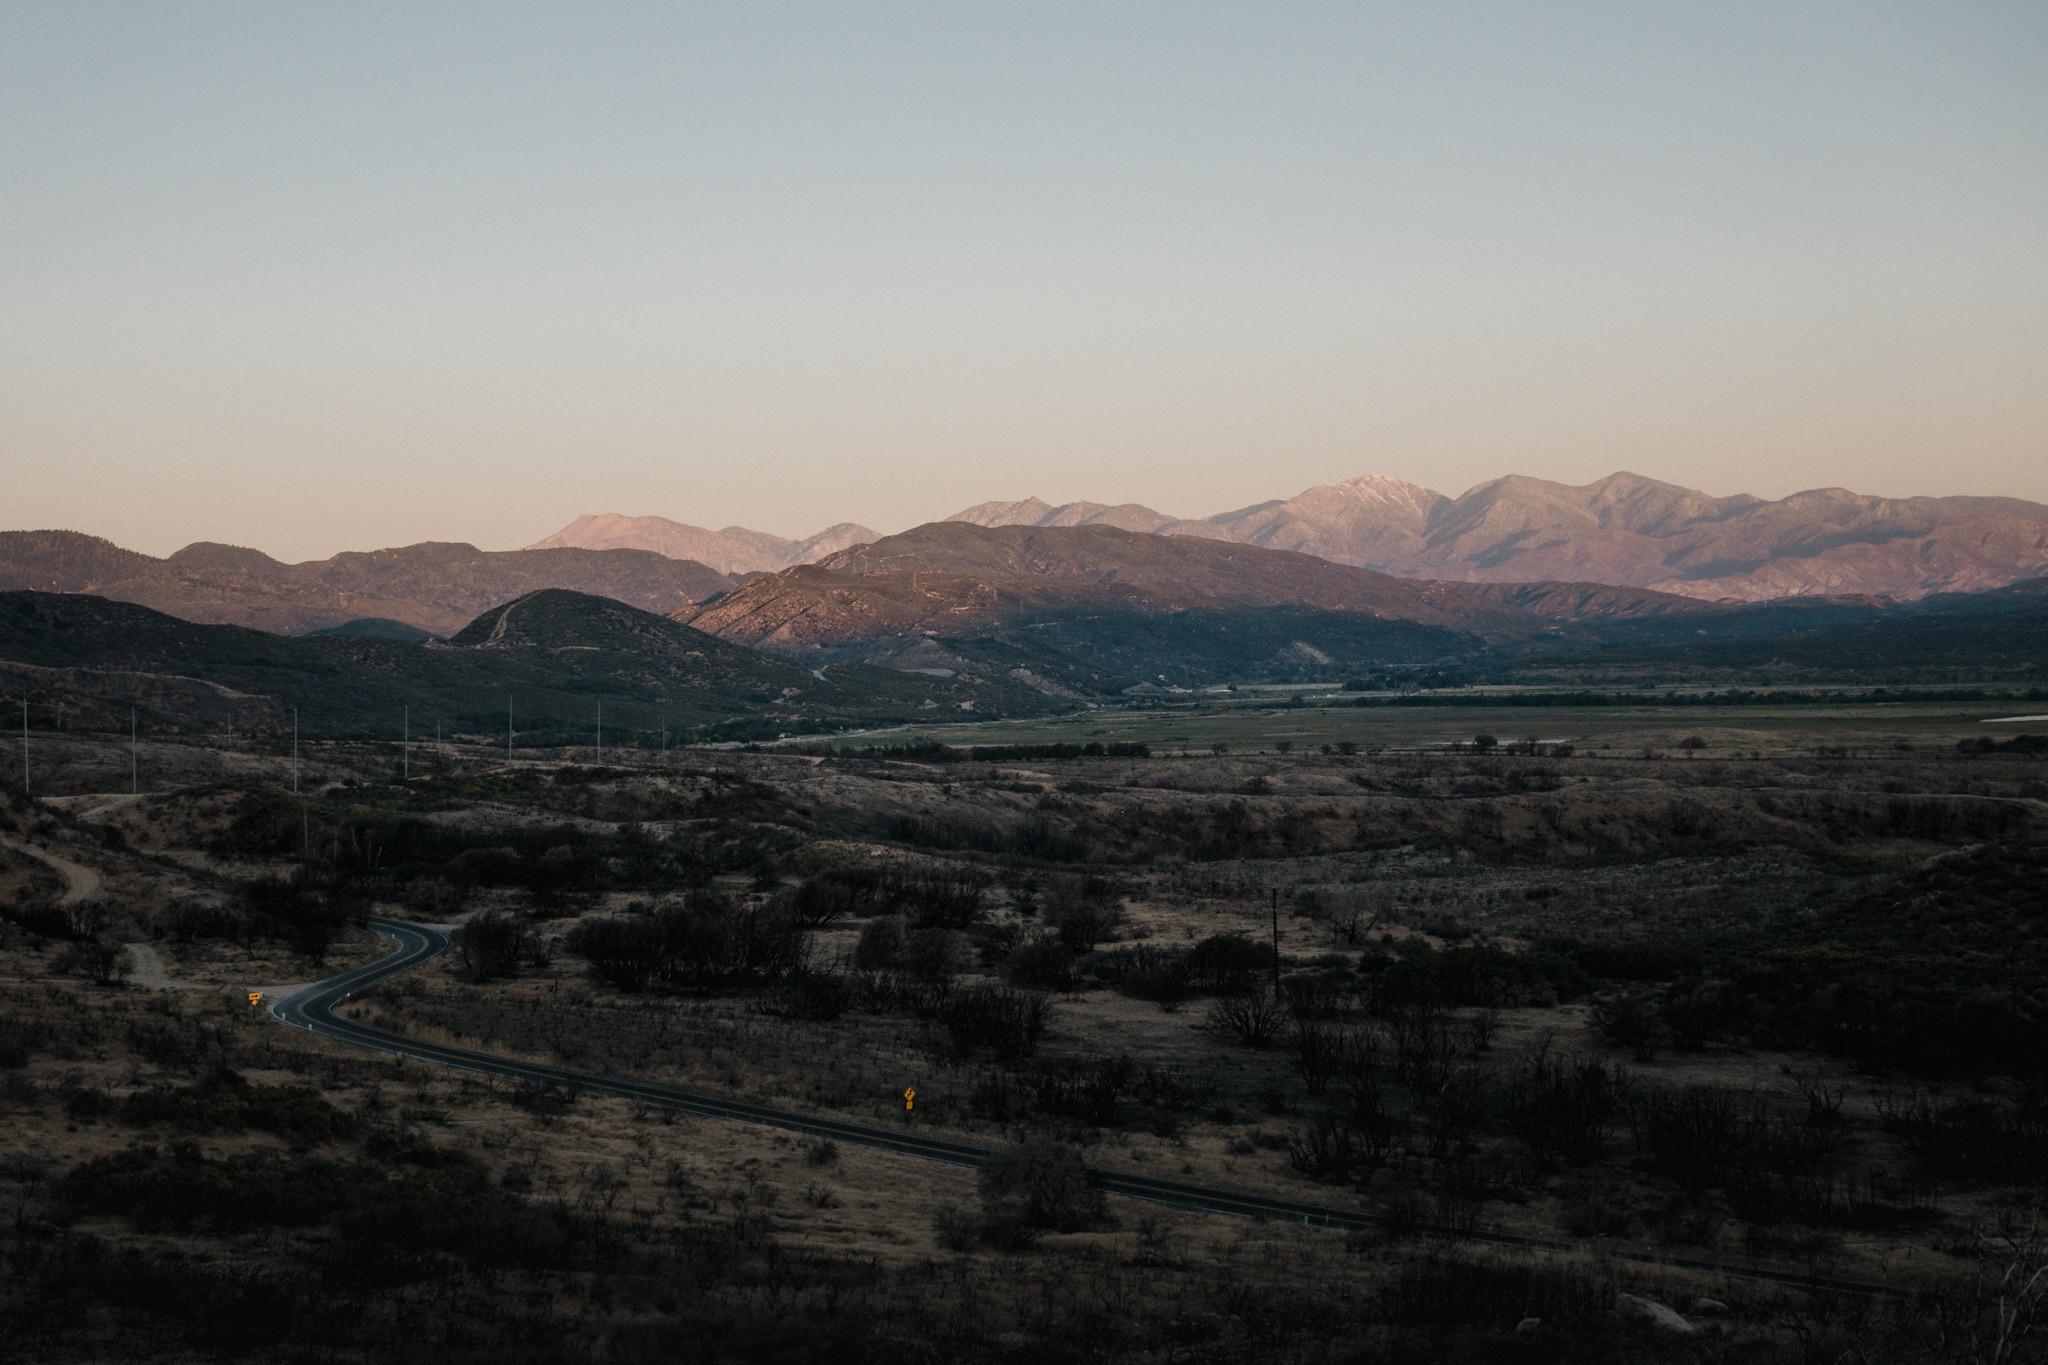 Morning views.